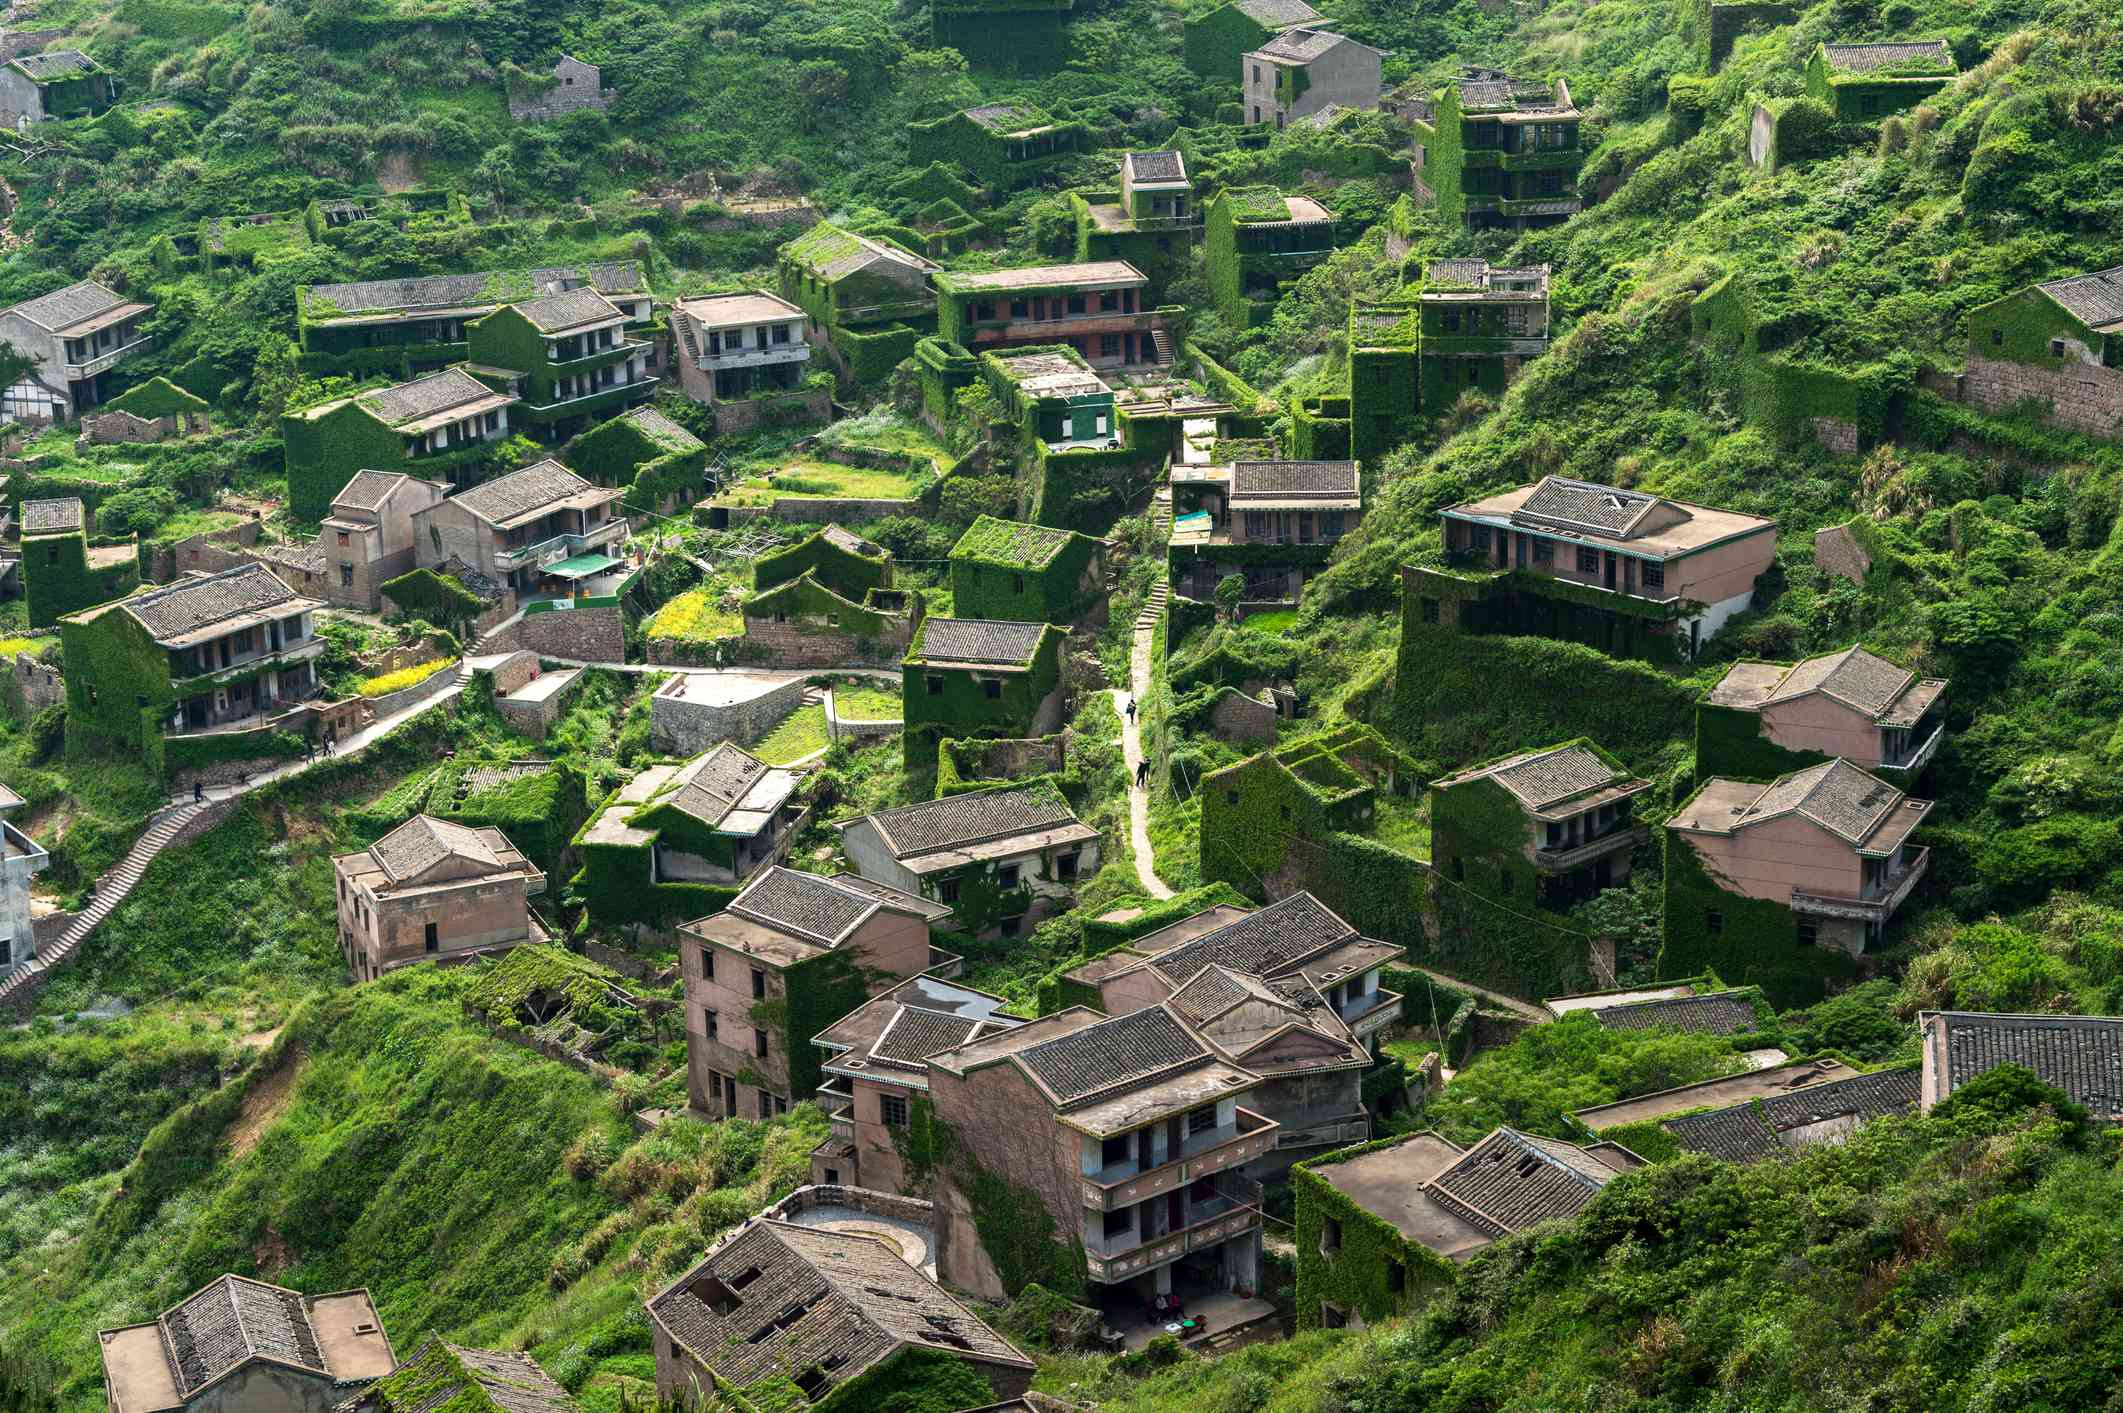 Greenery growing over Gouqi island's abandoned village